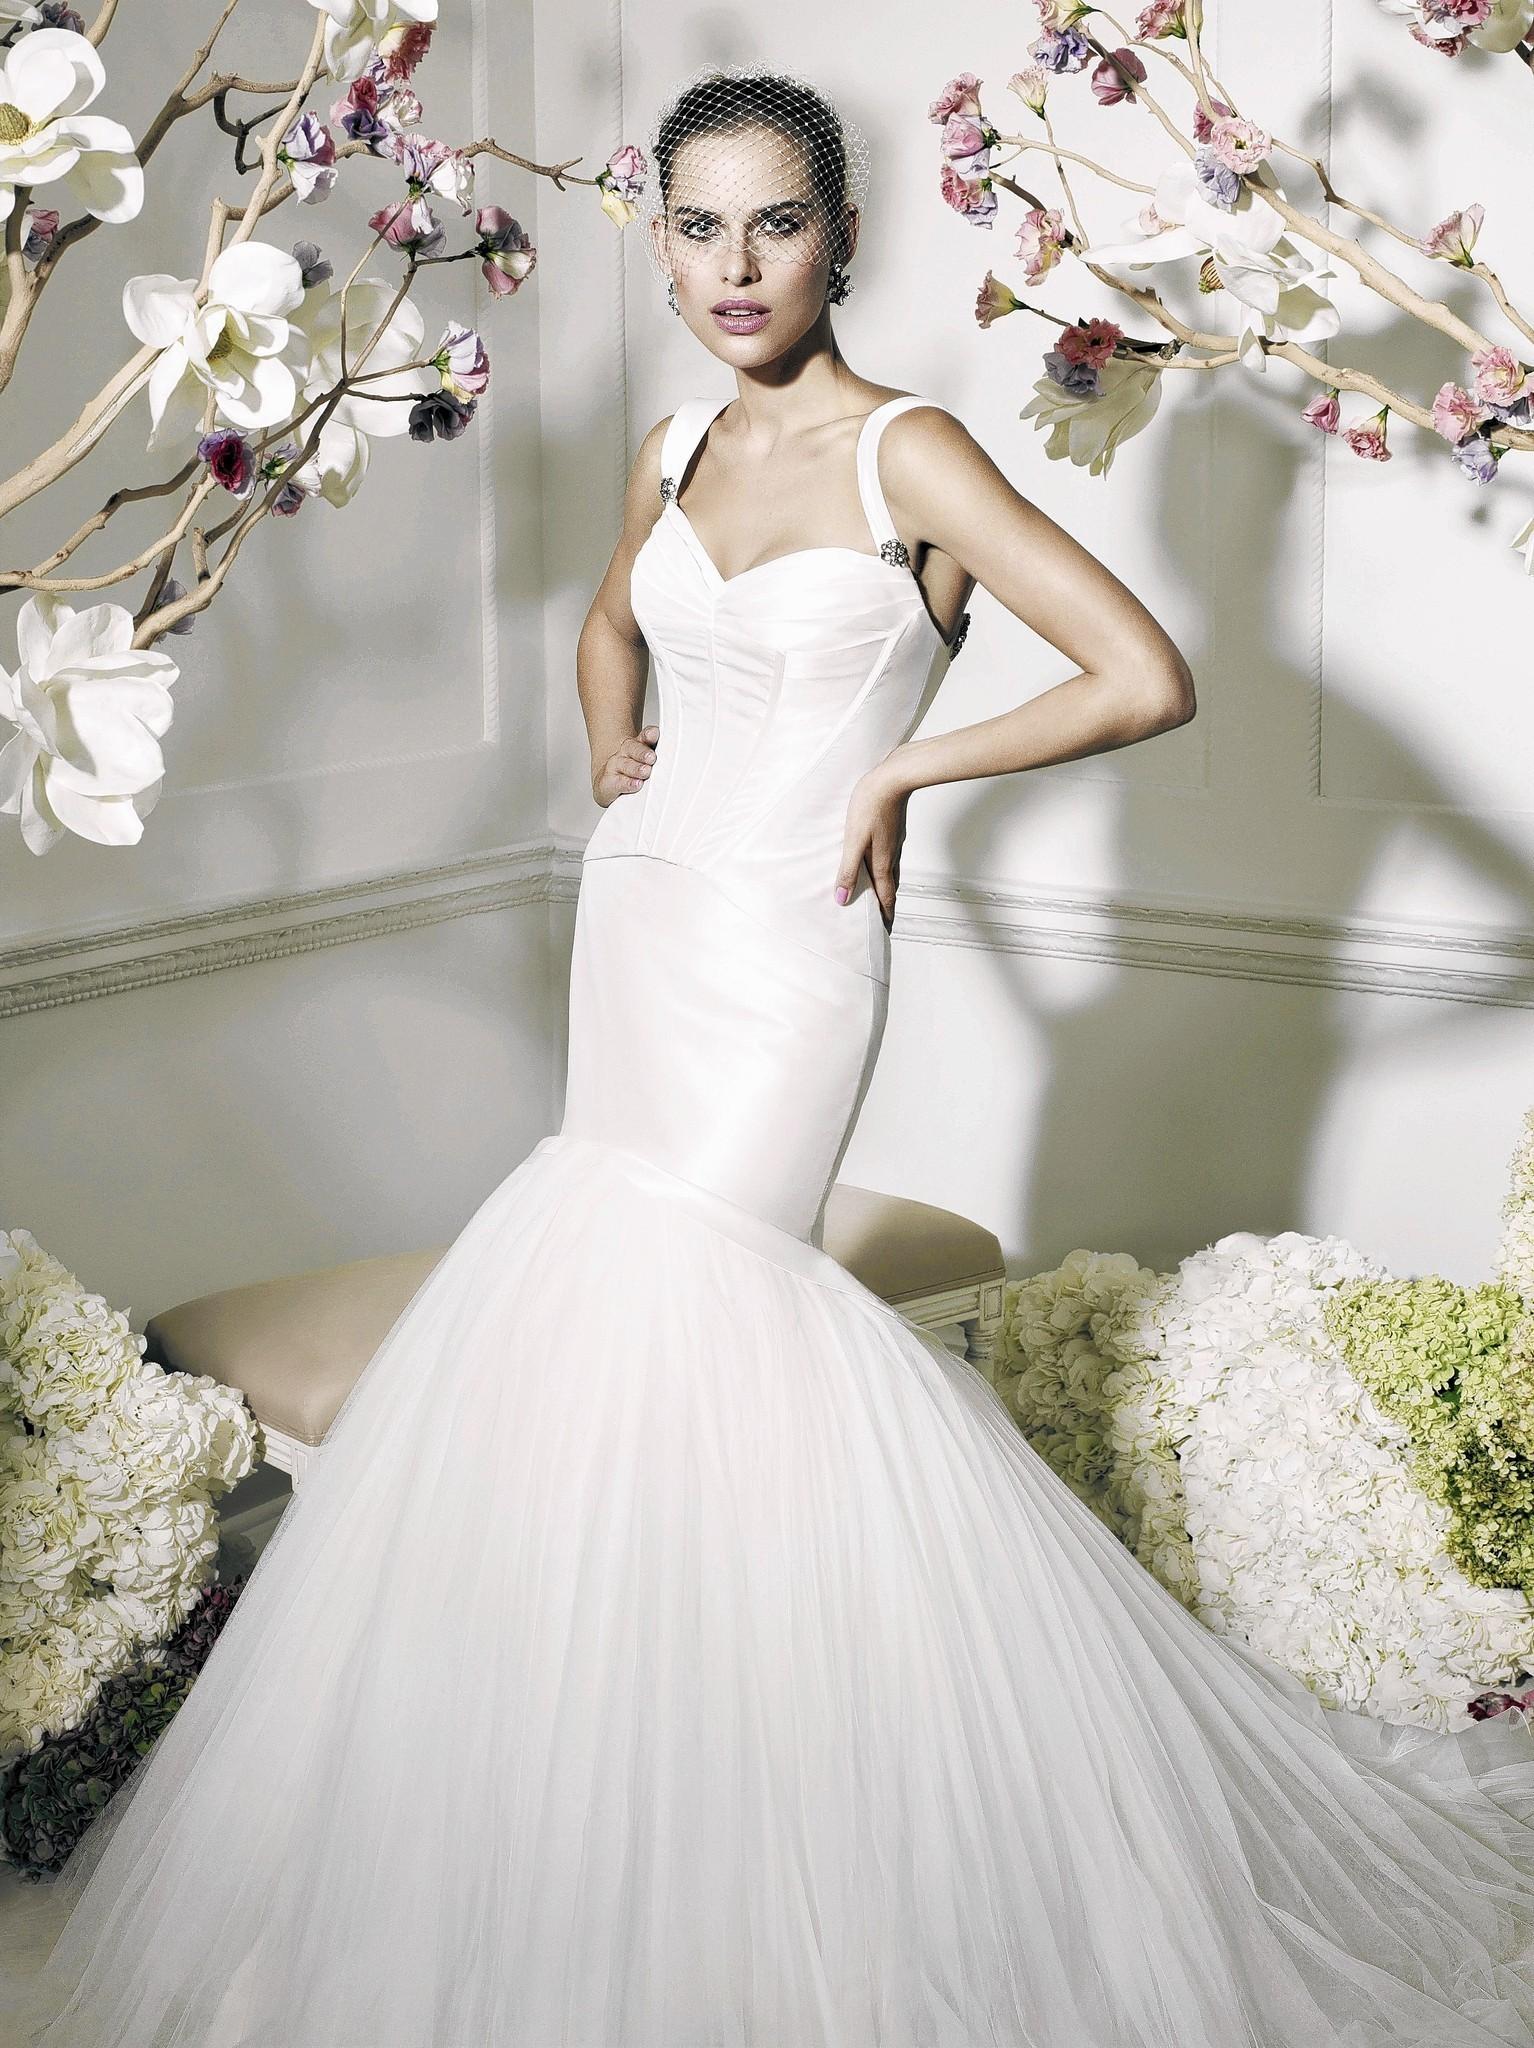 Mismatched elegance is bridal goal at weddings - Chicago Tribune